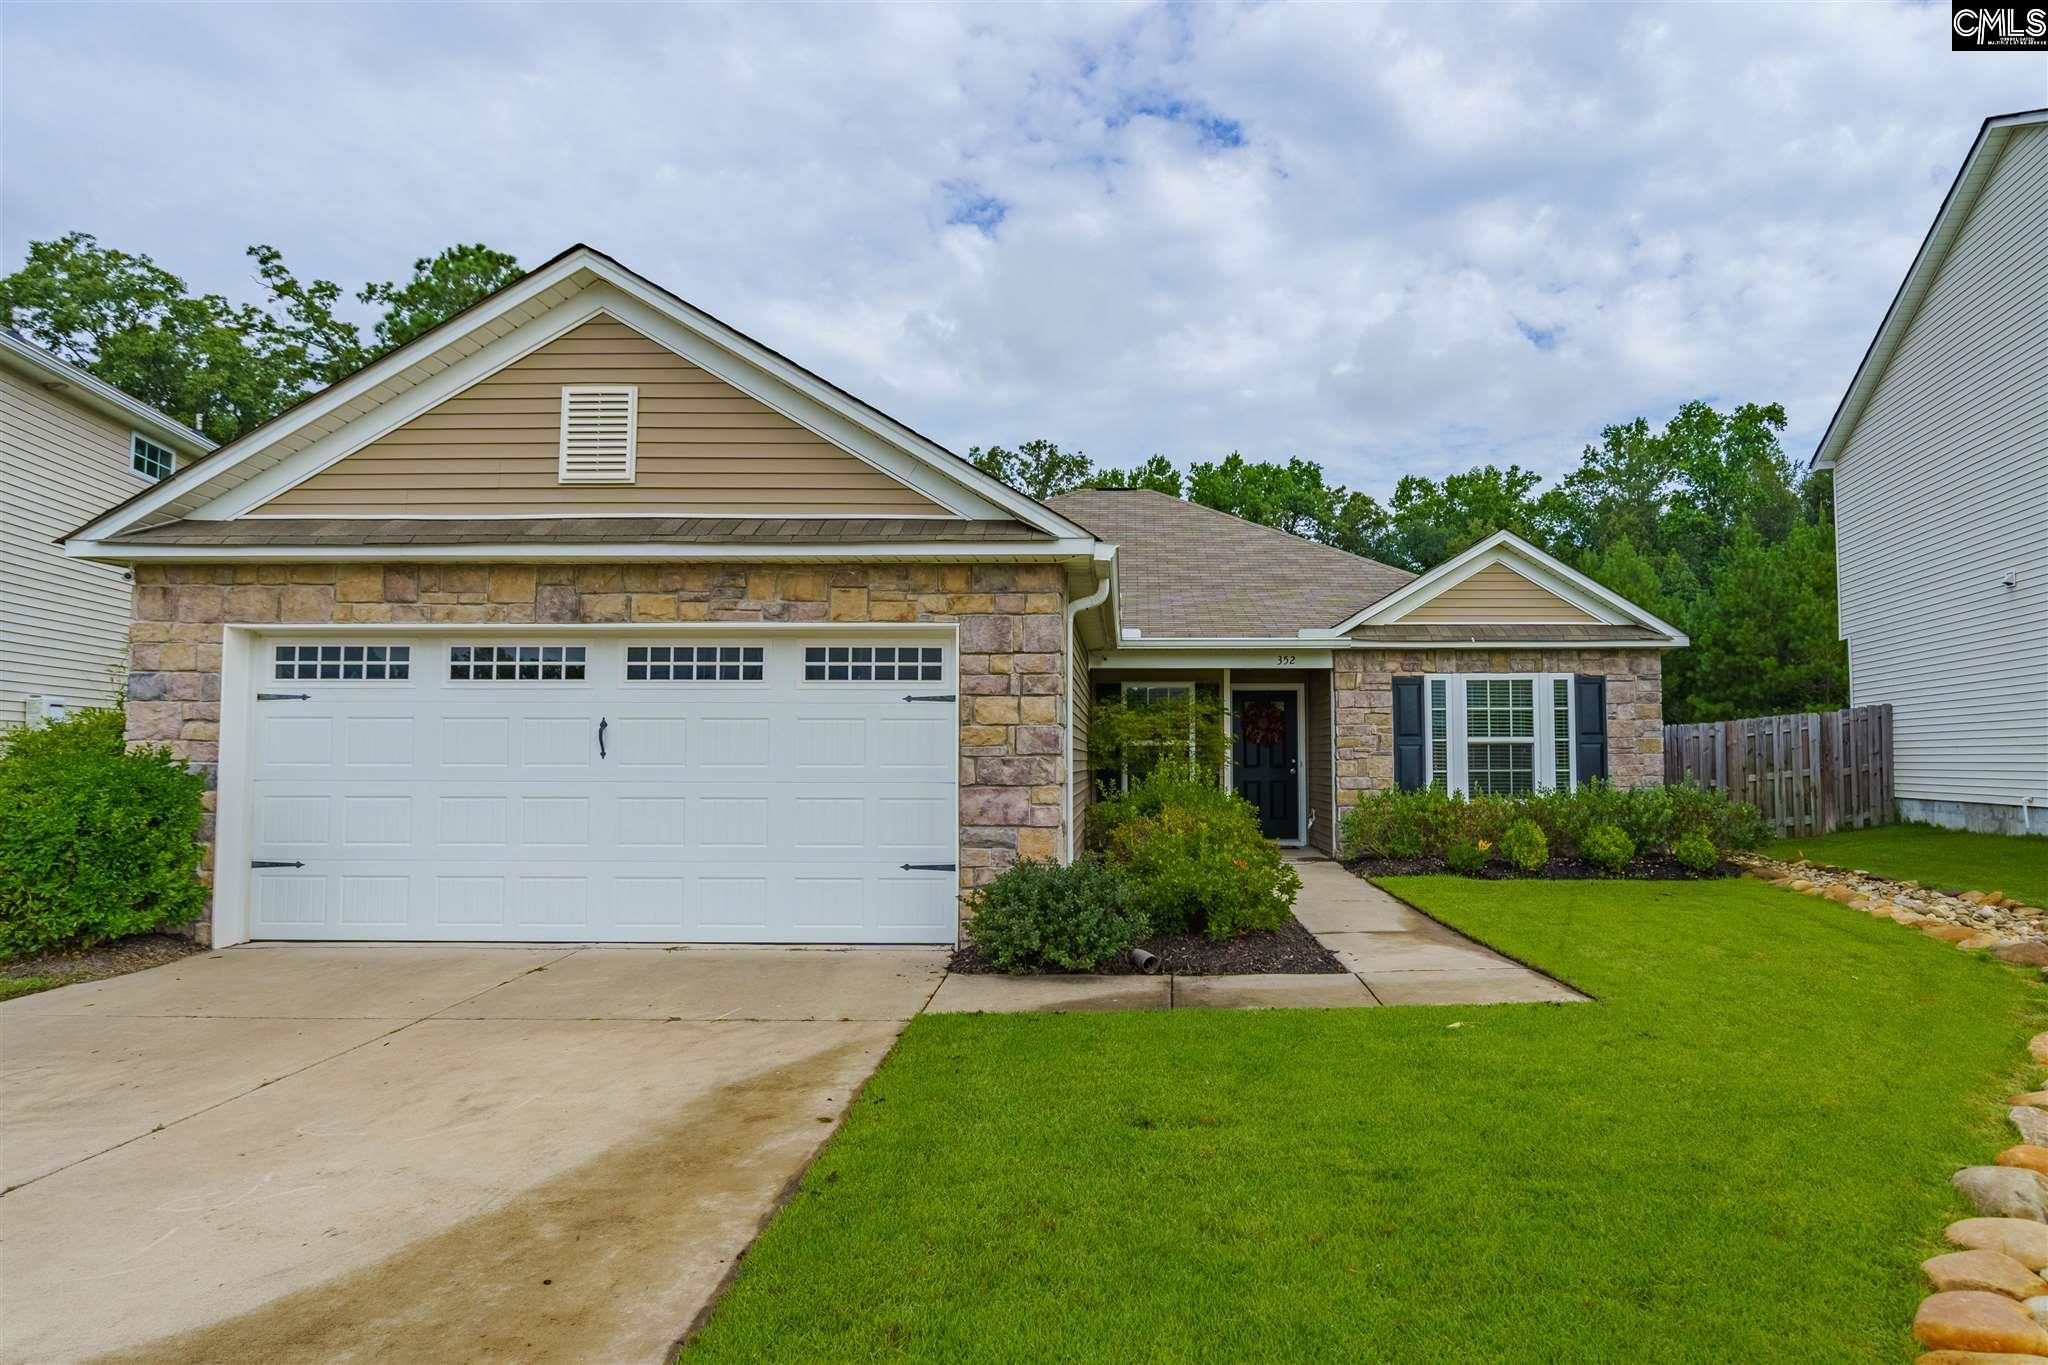 Jacobs Creek Neighborhood Homes for Sale in Northeast Columbia SC